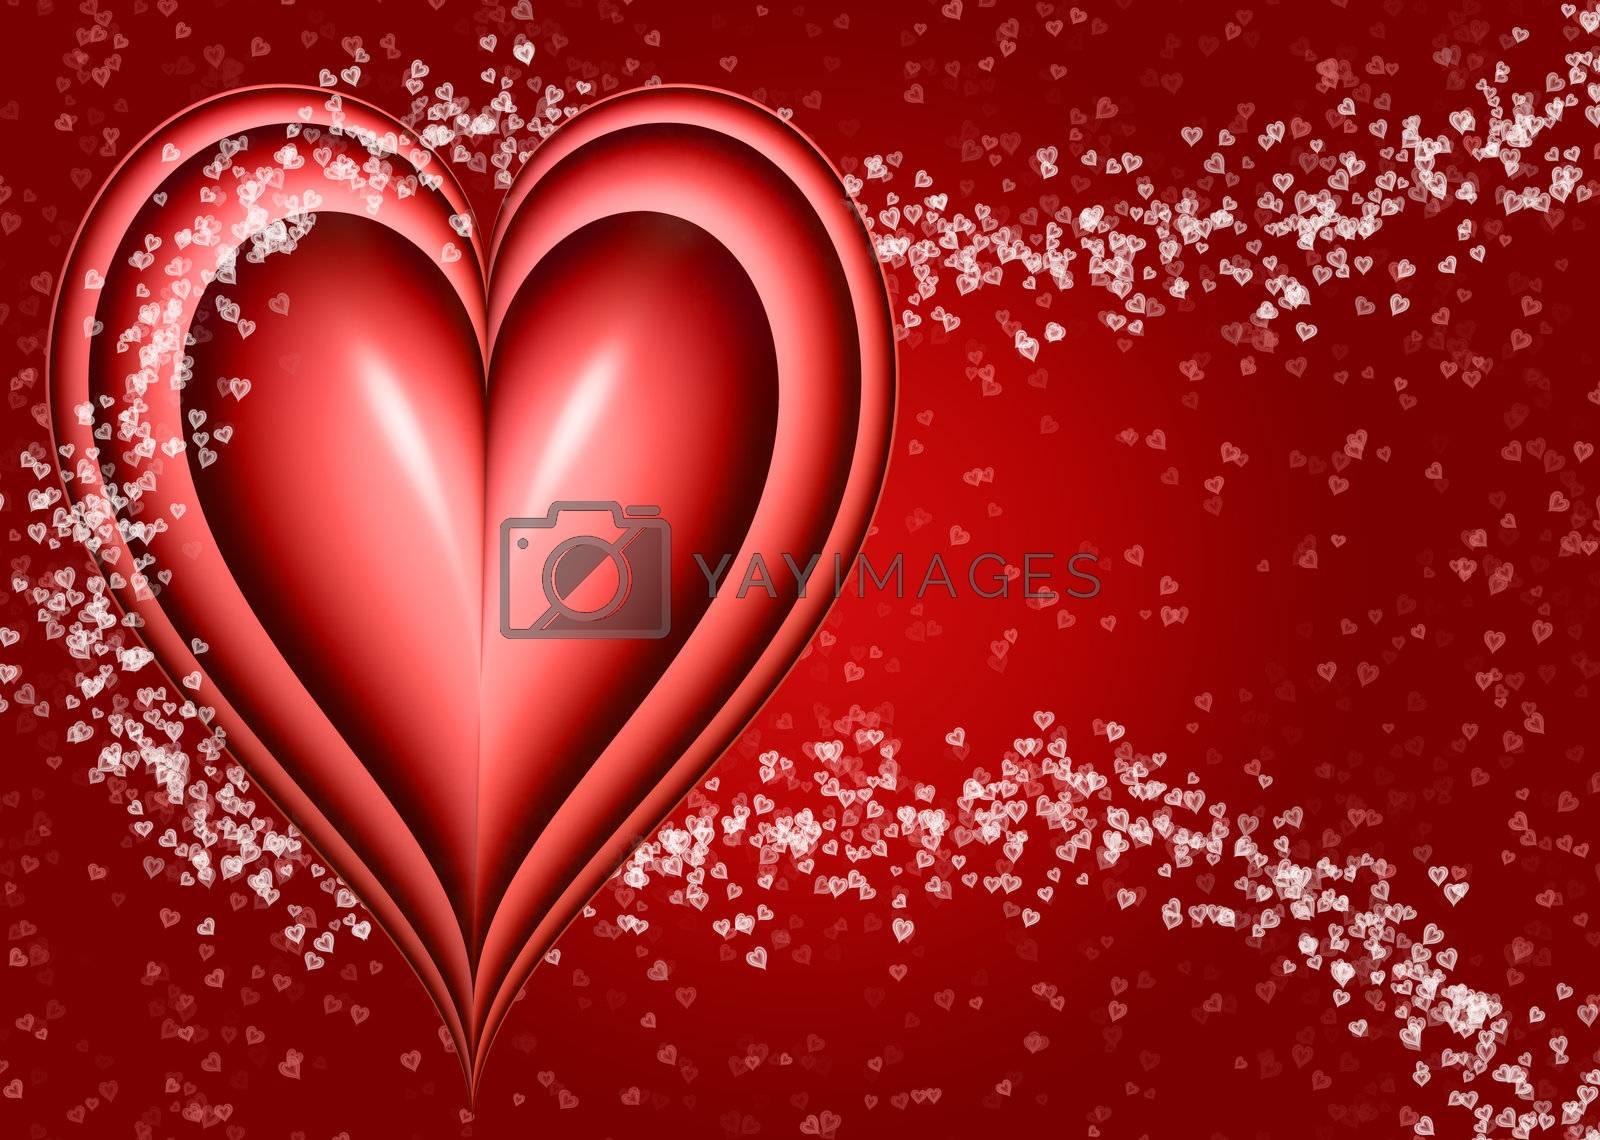 valentine love heart design with smaller hearts